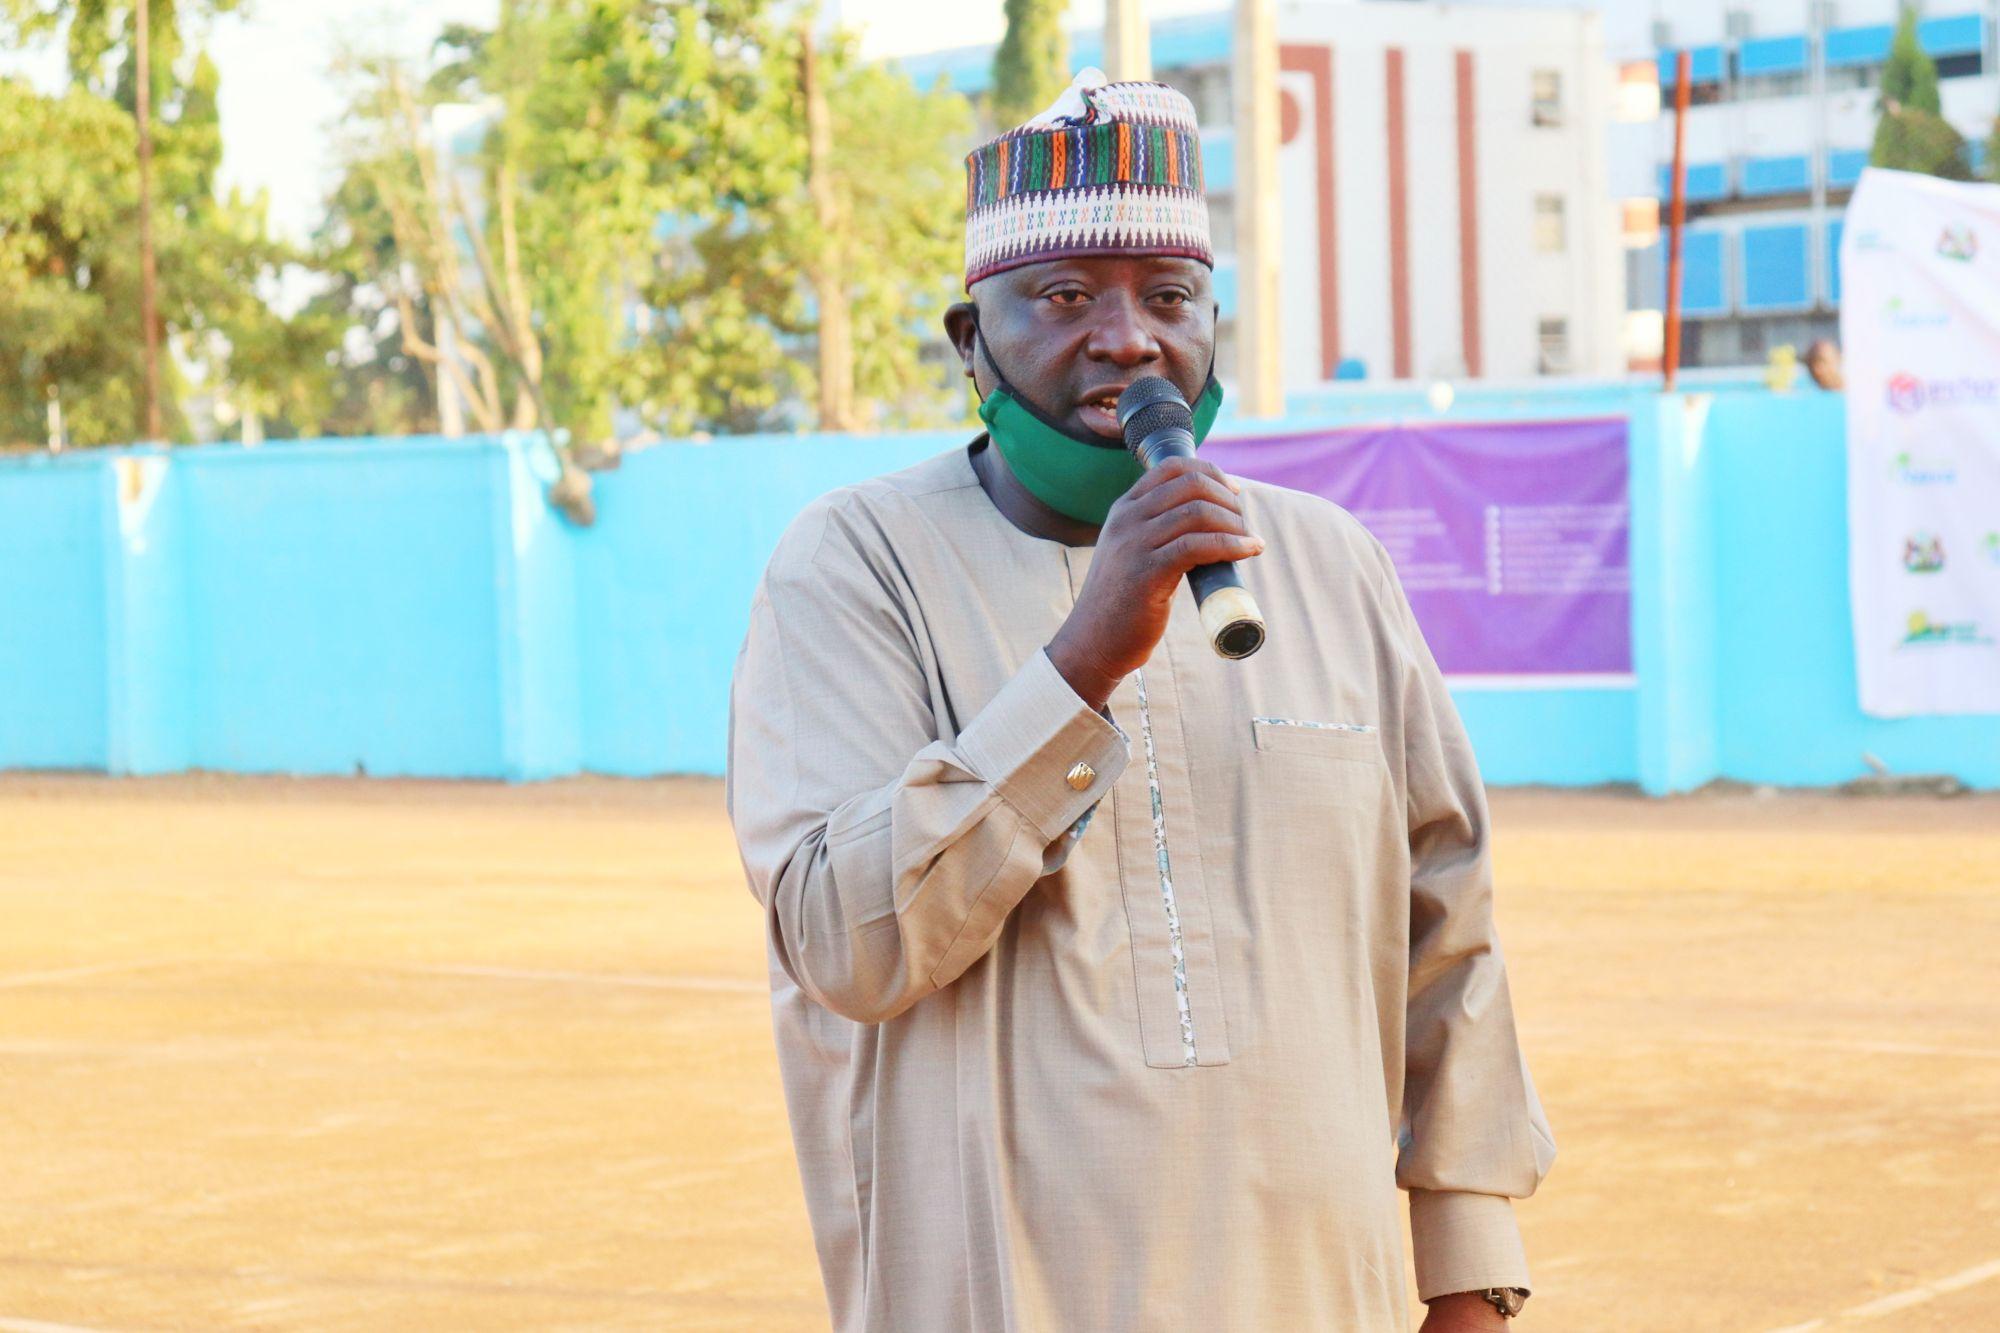 Chairman Kaduna State Tennis Association Joel Adi